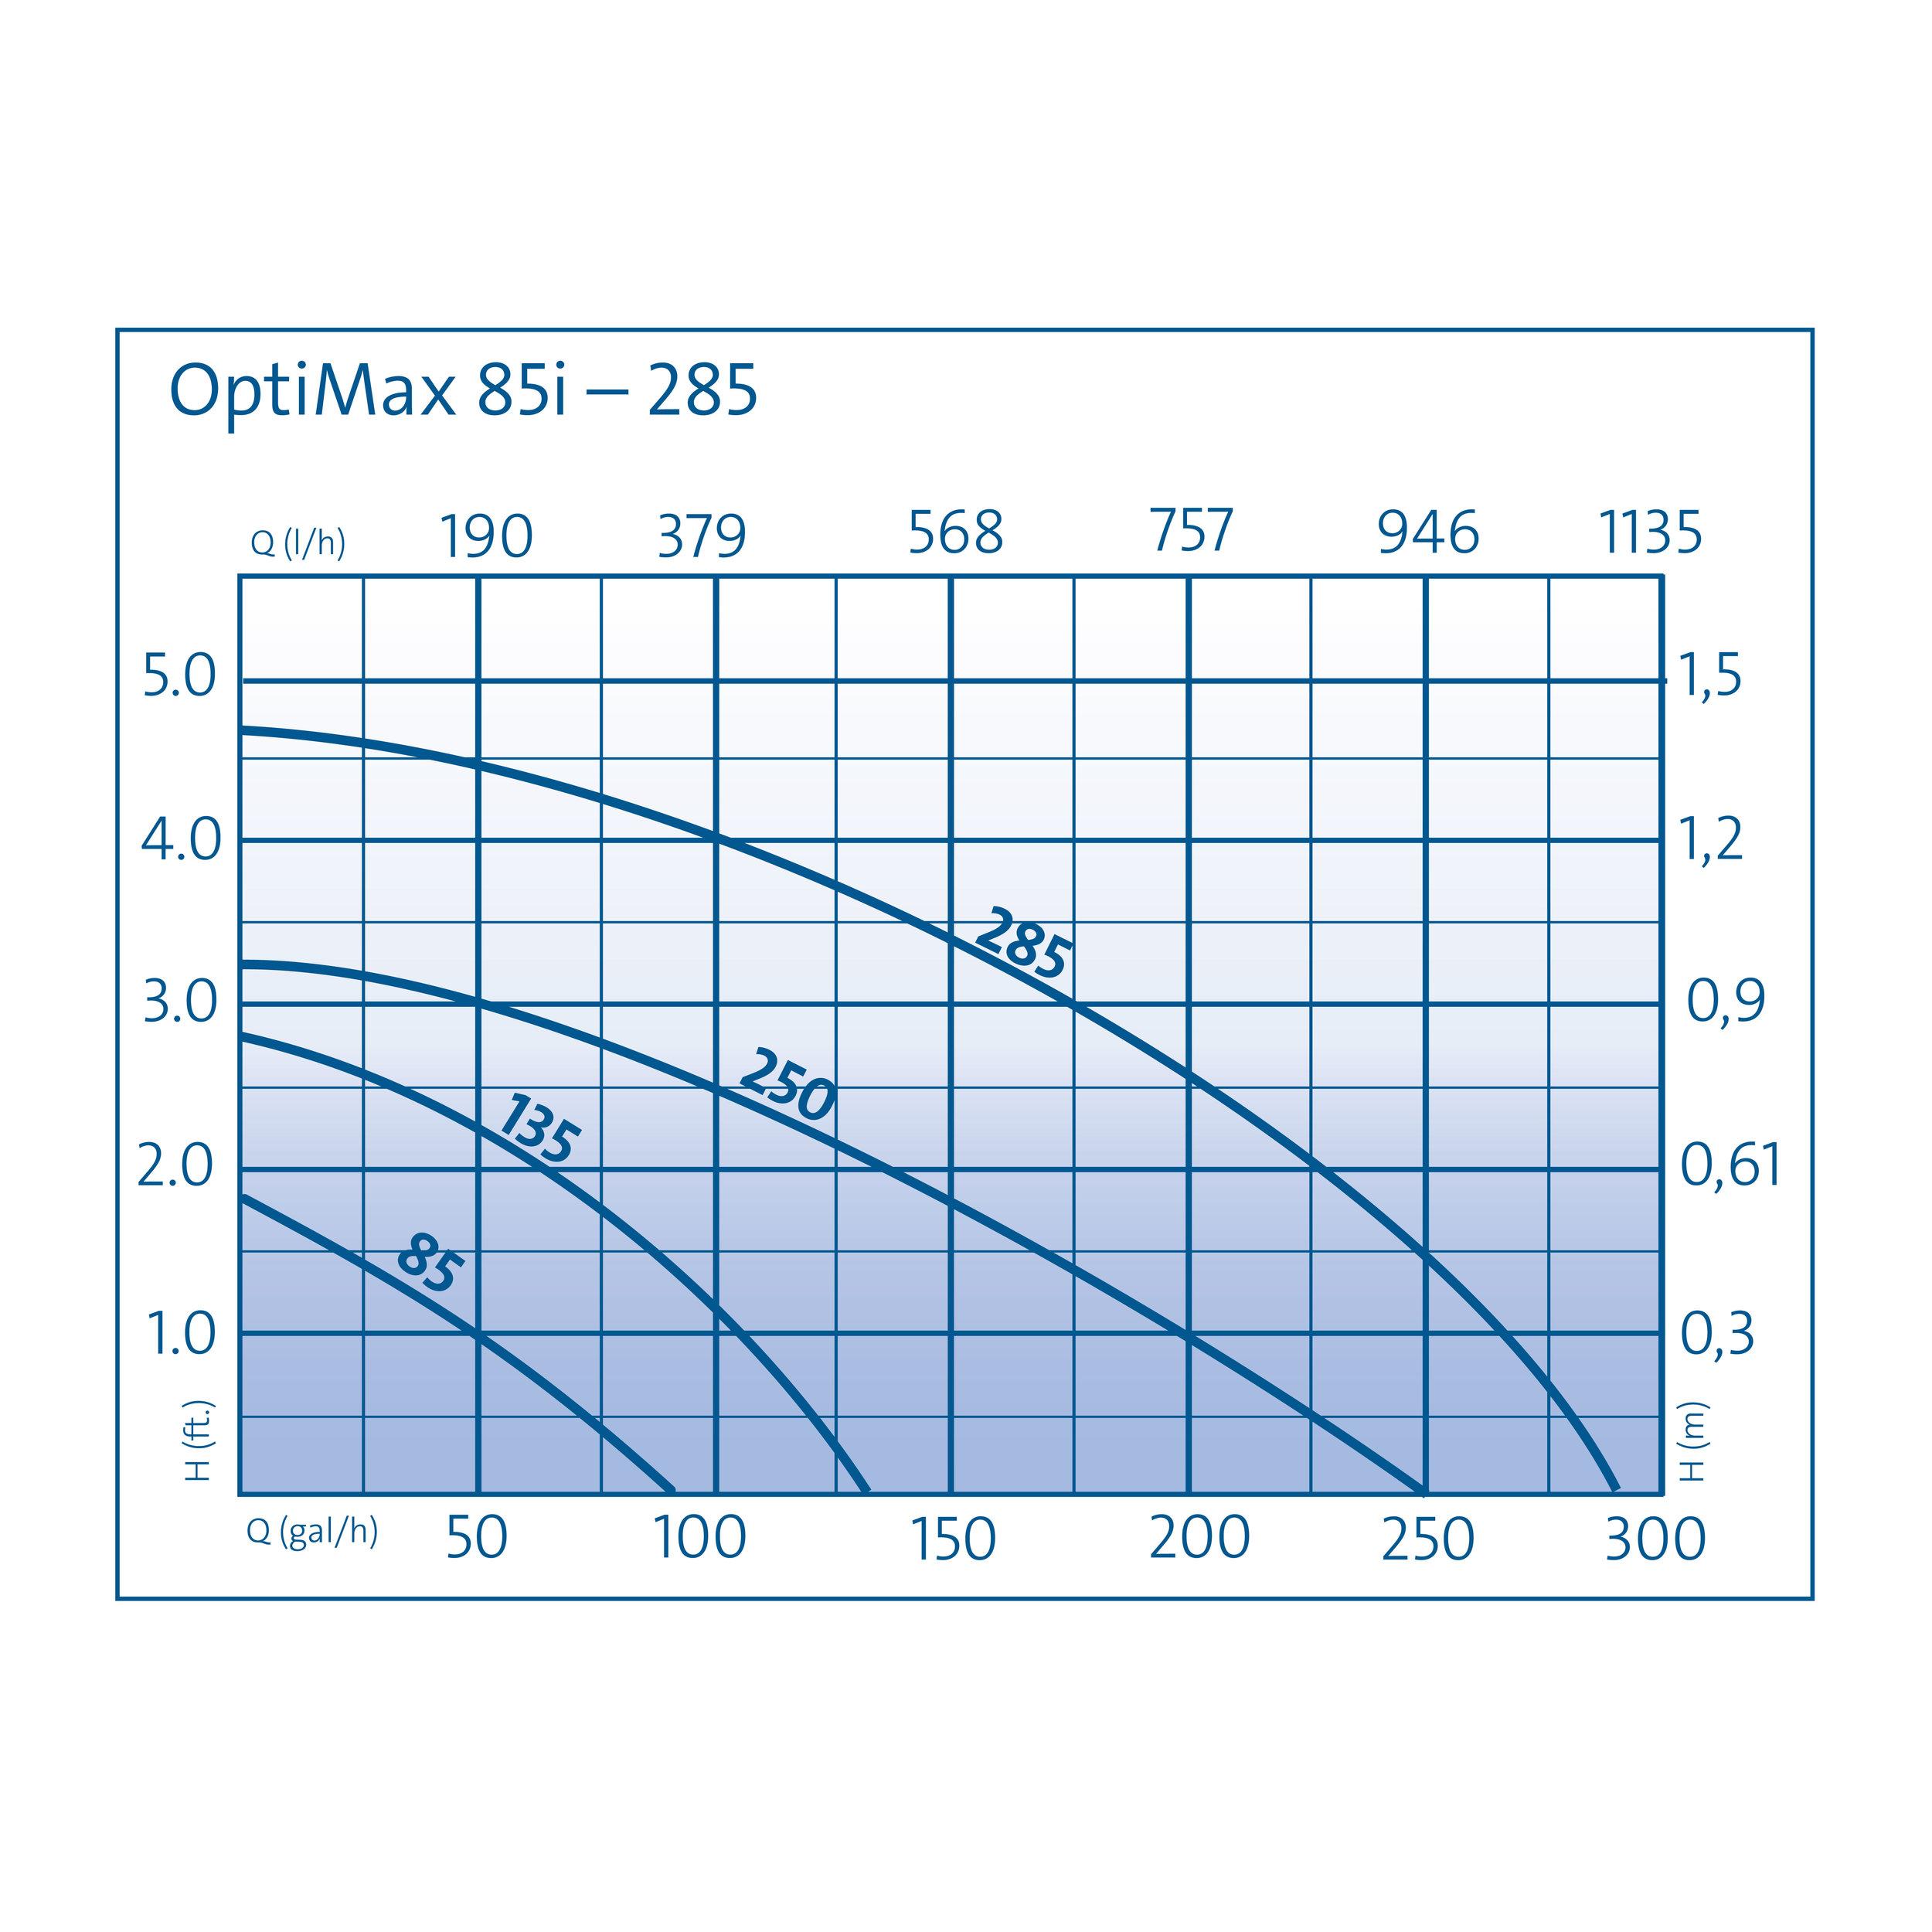 optimax-chart-01.jpg